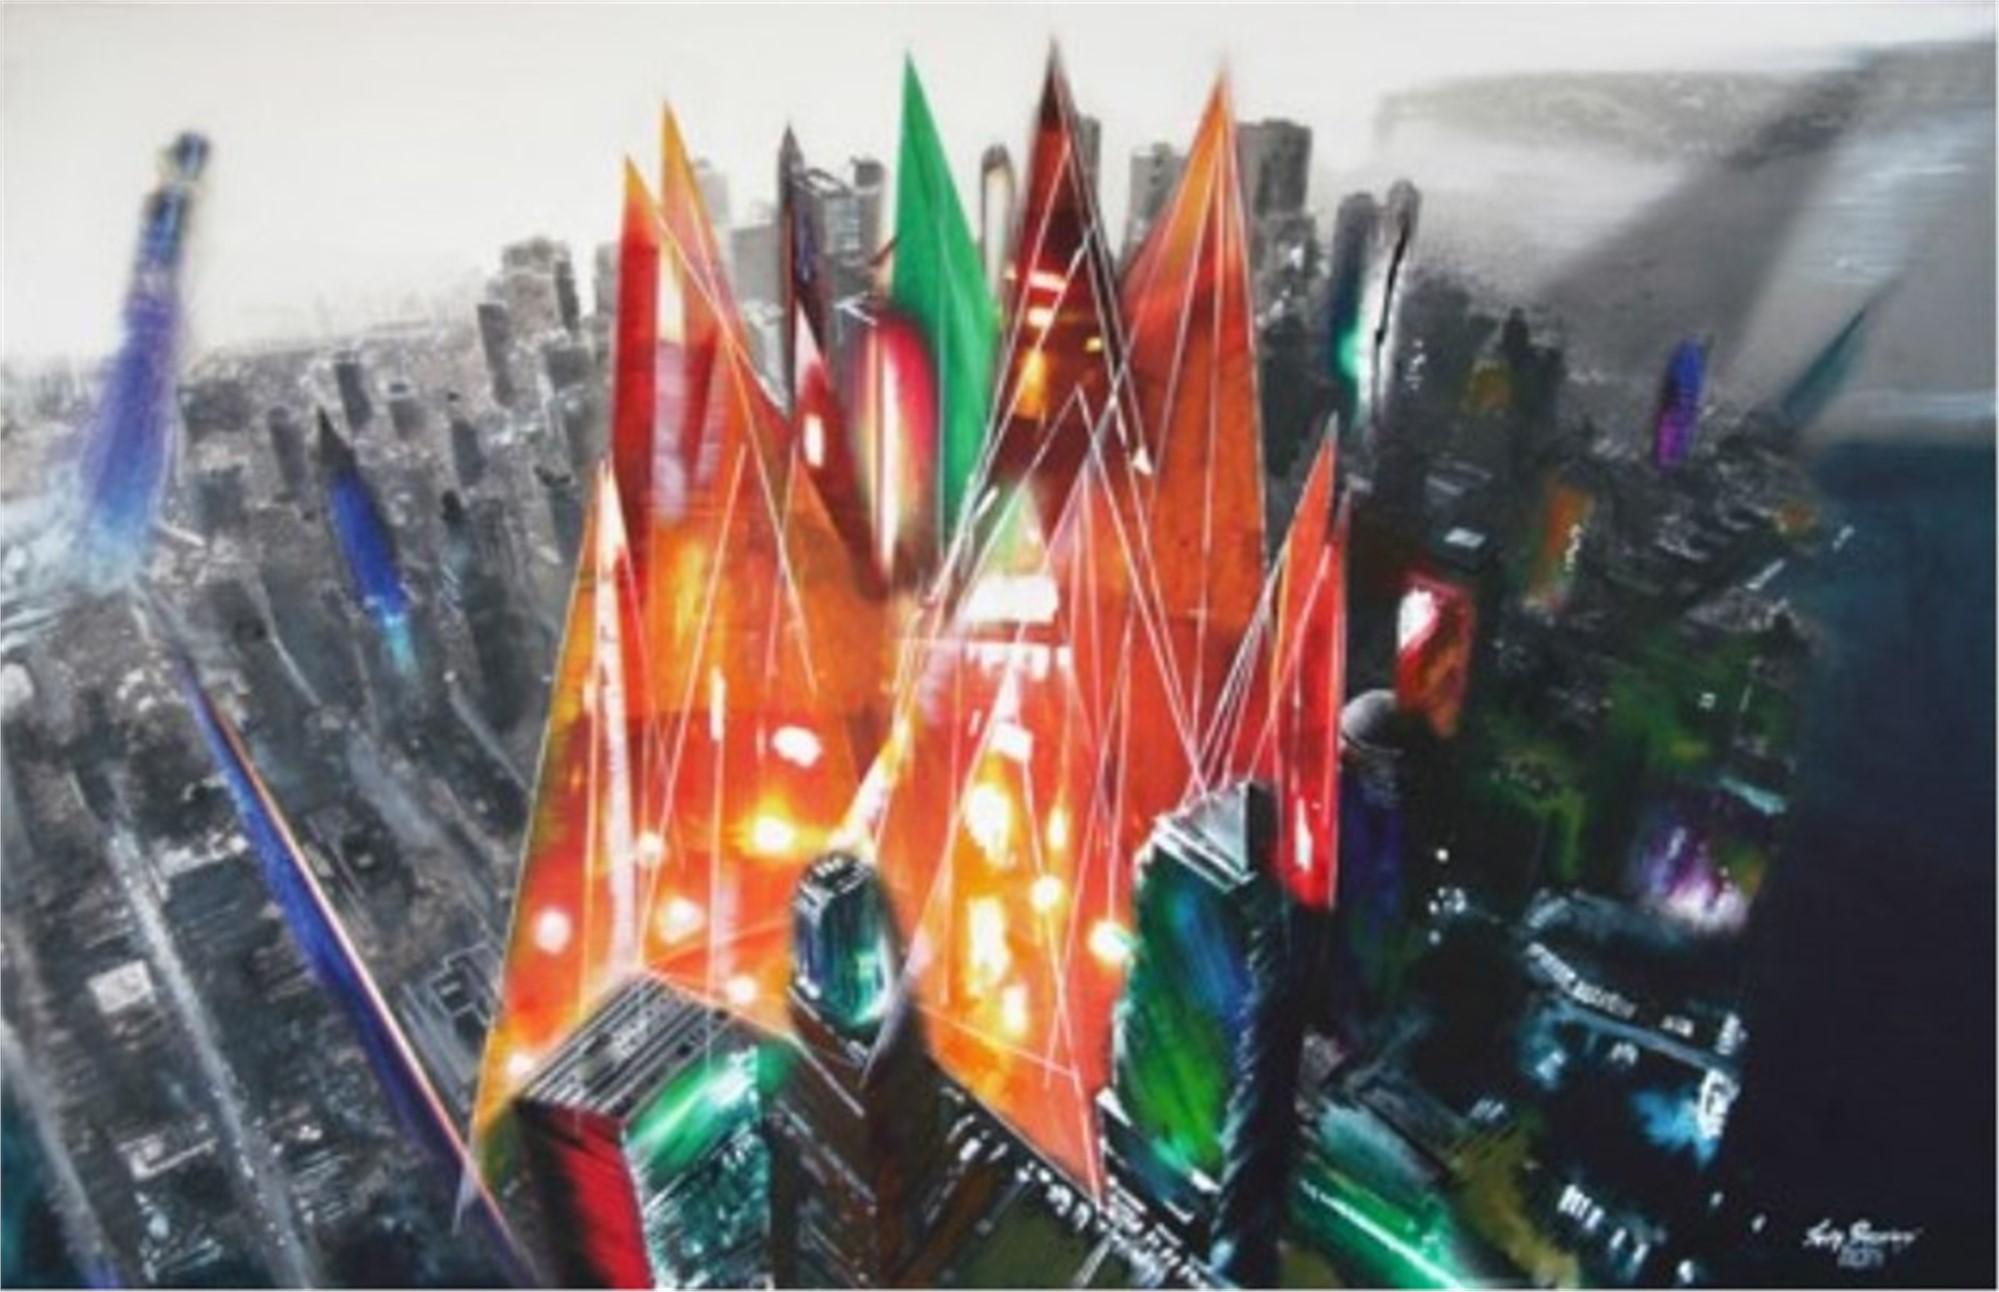 New York Axis Mundi by Lisa Borgiani